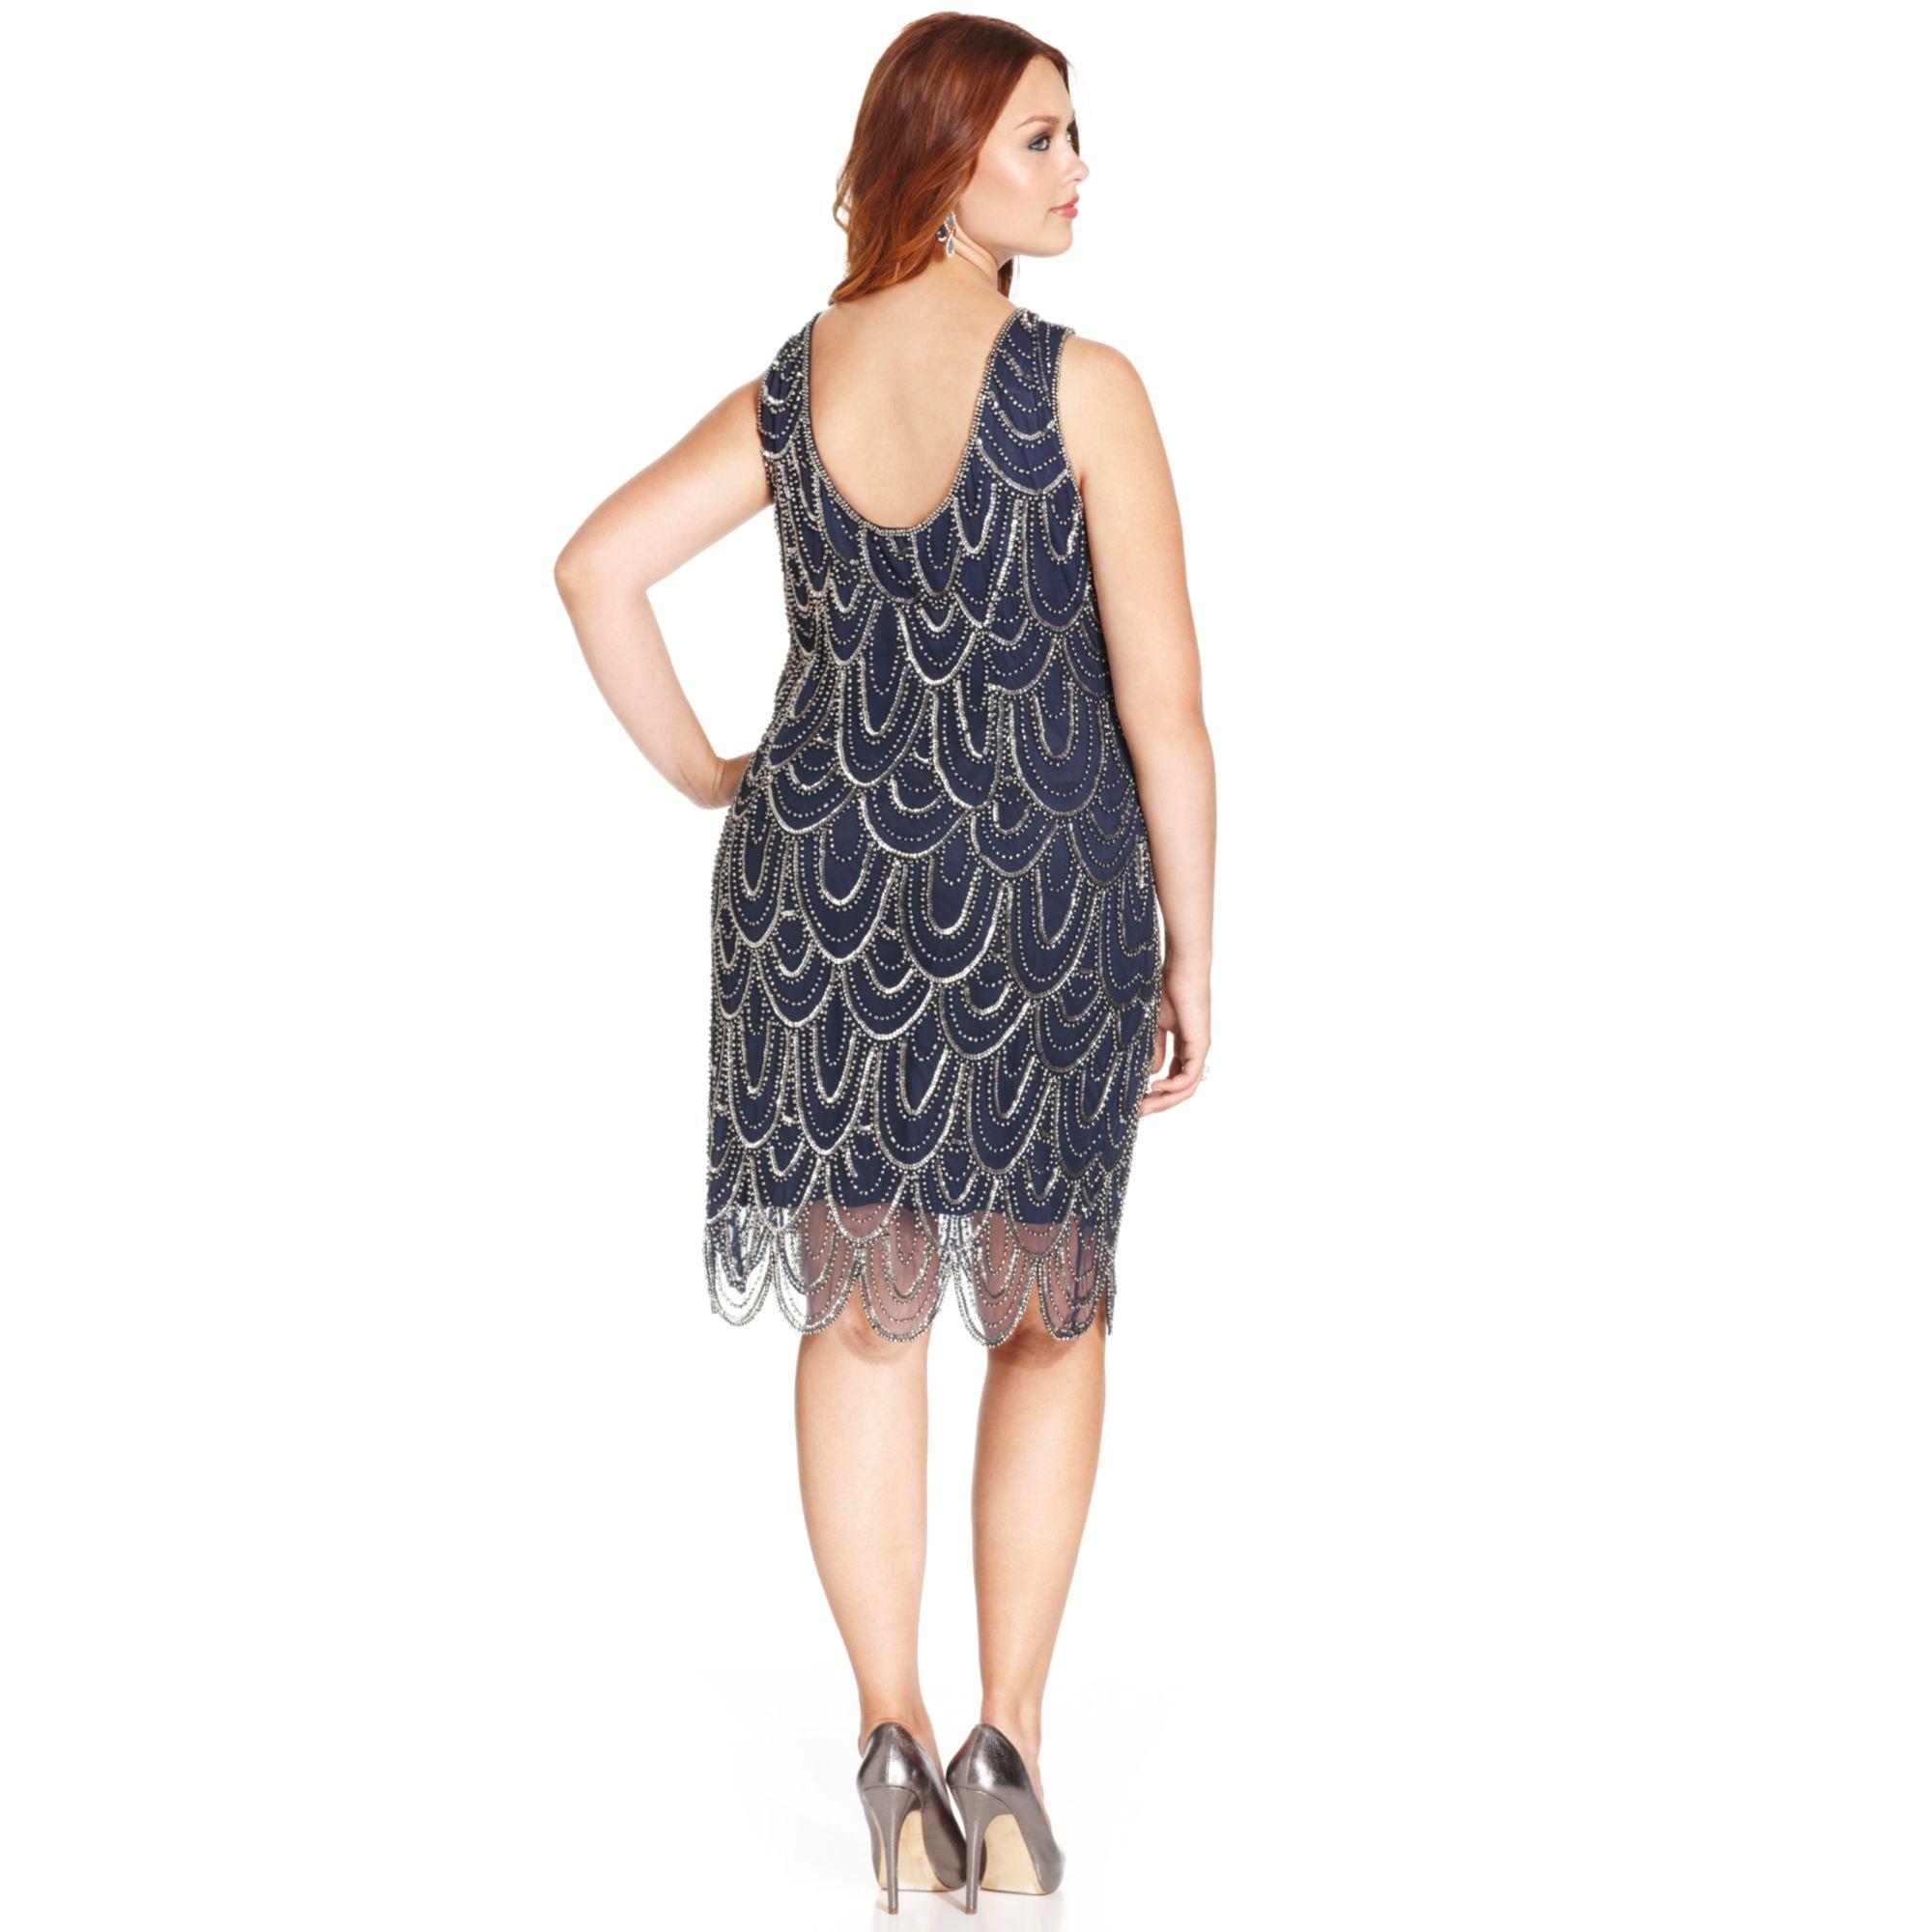 043bda697ba Pisarro Nights Embellished Cocktail Dress - Data Dynamic AG